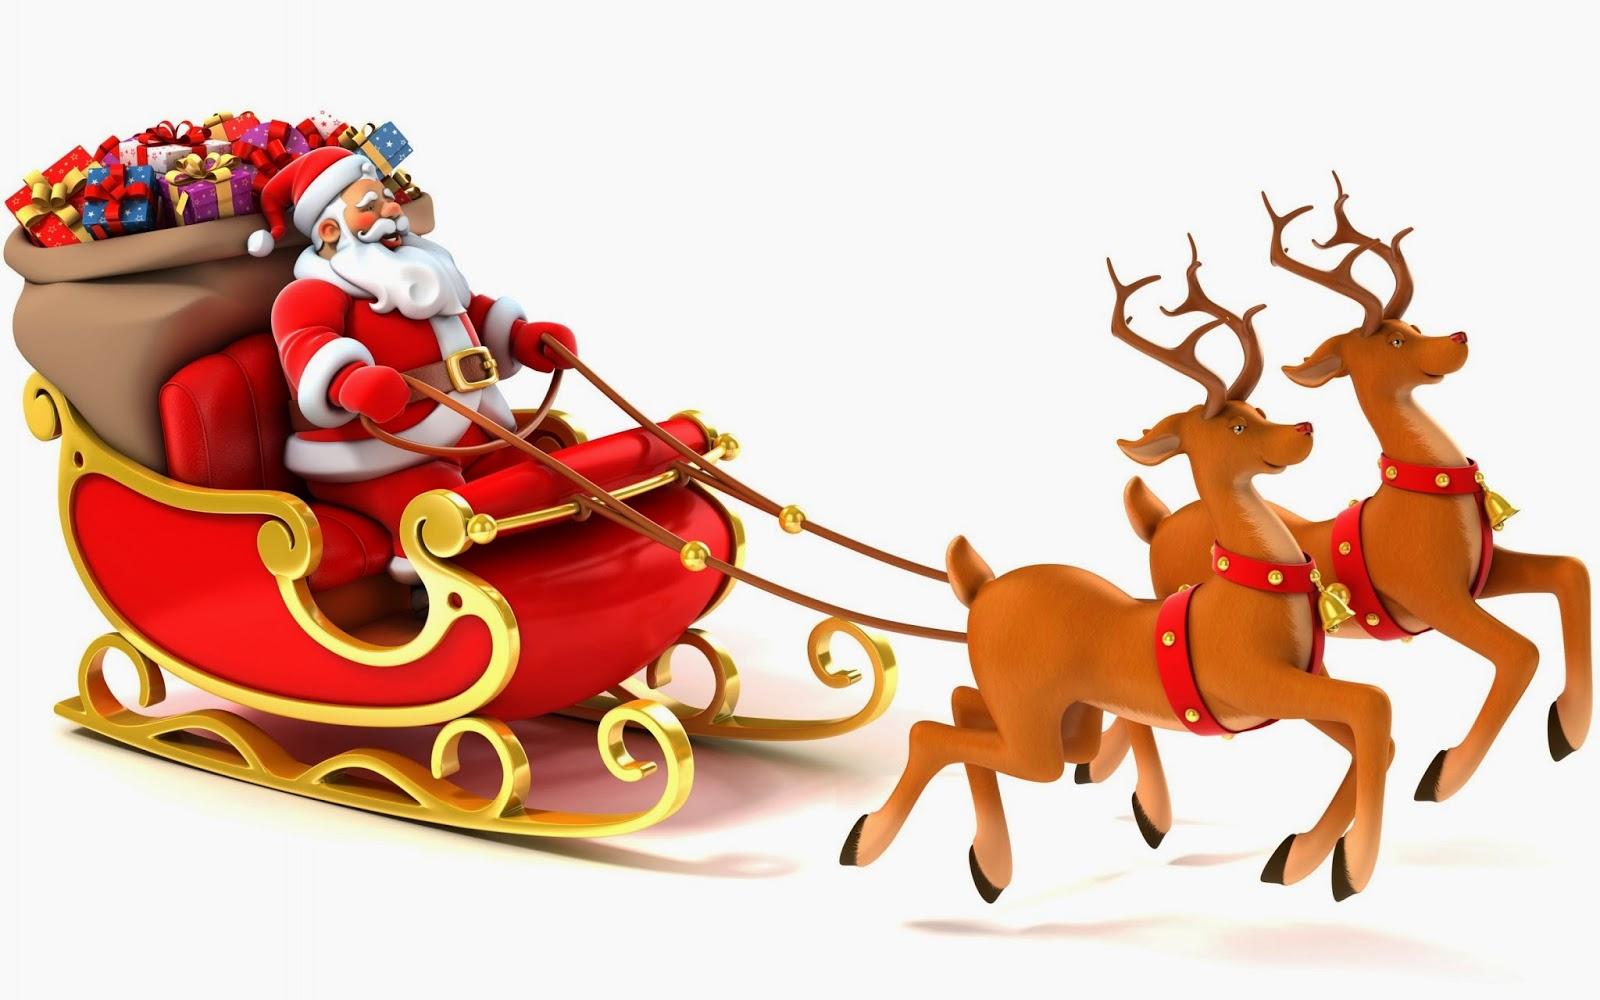 Sleigh clipart santa s. Free cliparts download clip